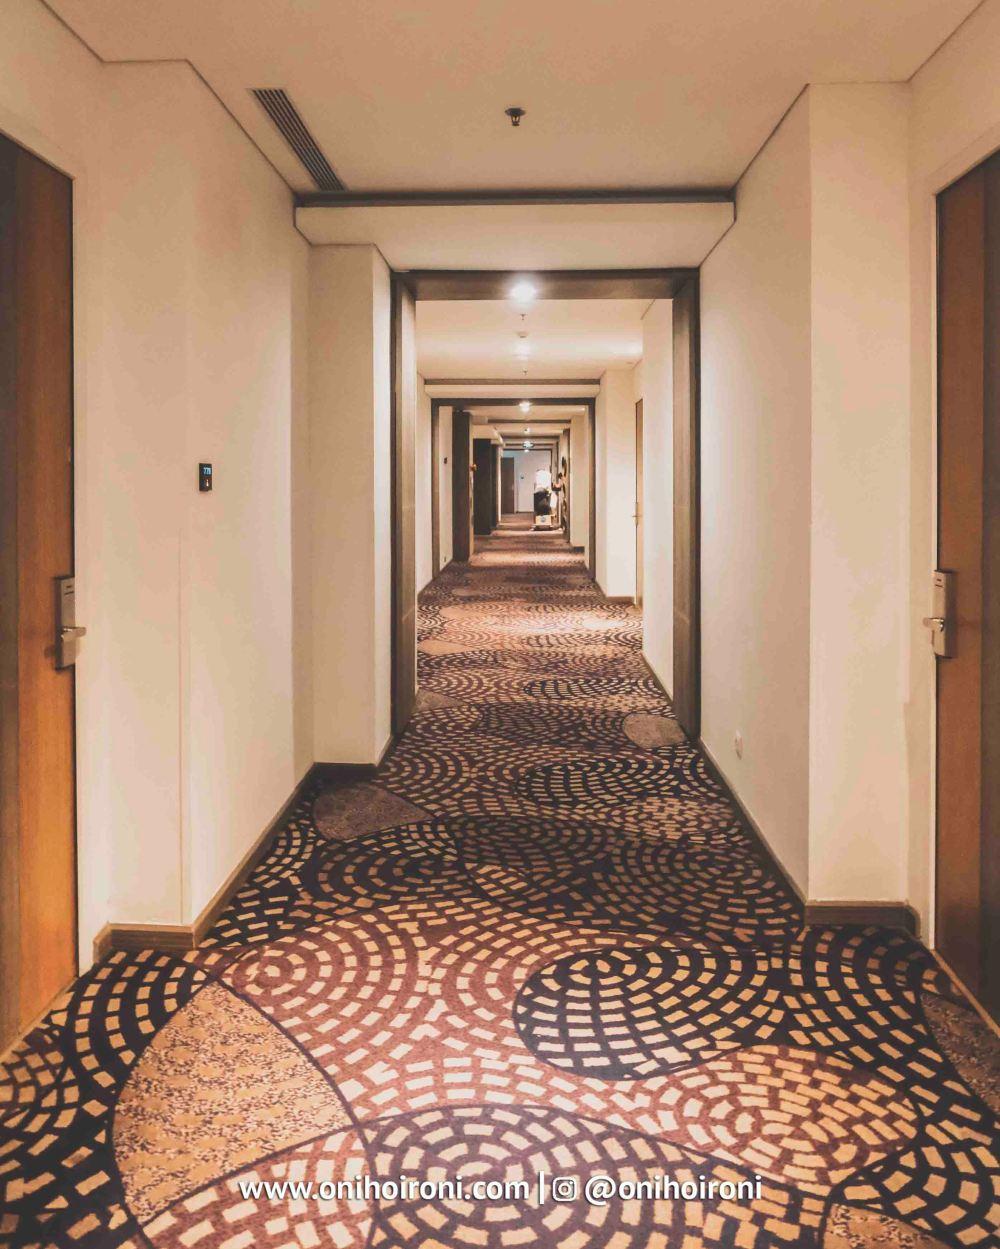 Room Holiday Inn Bandung Pasteur Oni Hoironi.jpg